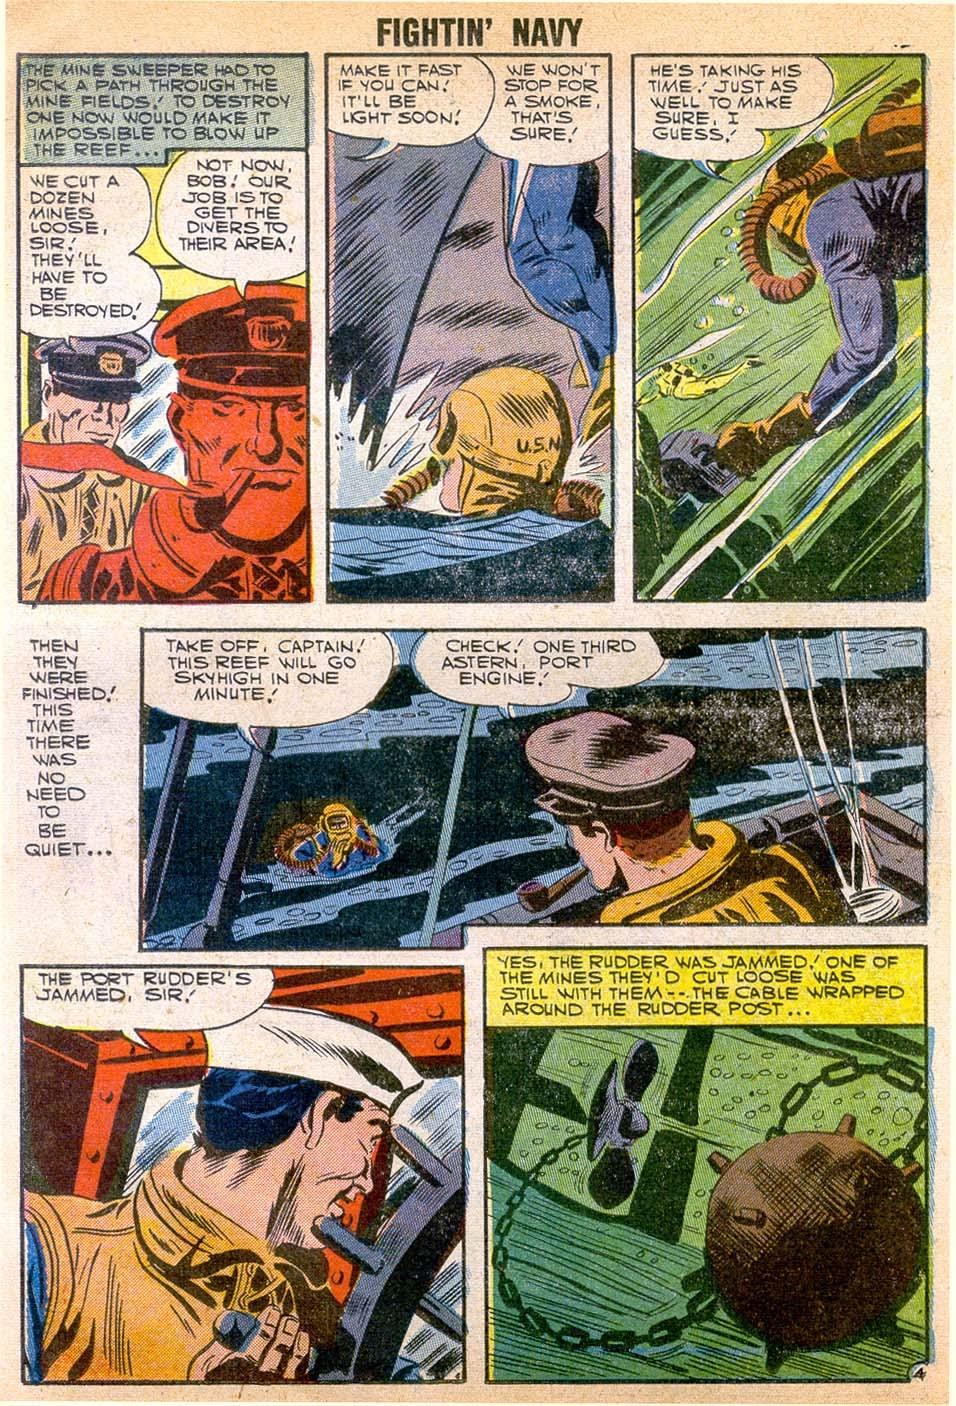 Read online Fightin' Navy comic -  Issue #79 - 14